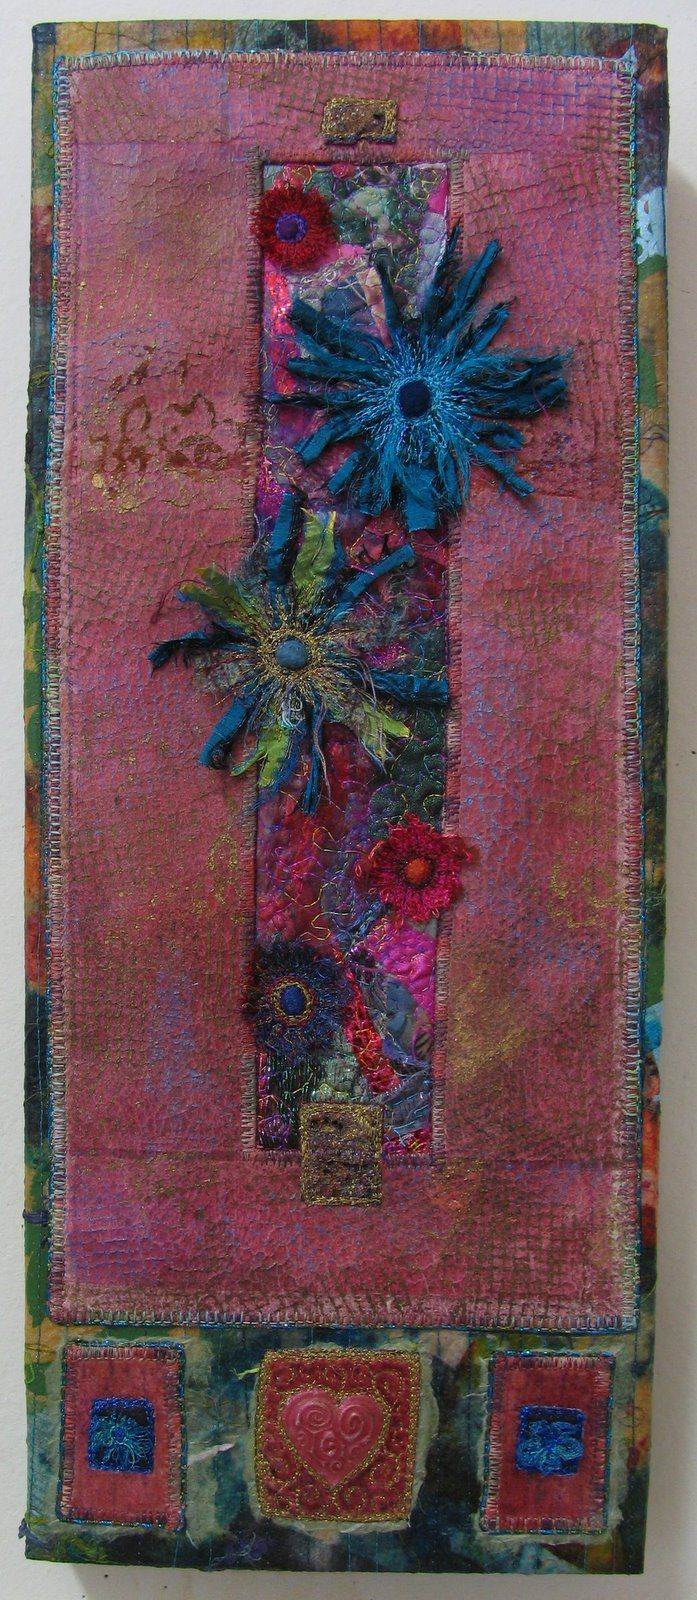 Linda Stokes Textile Artist: Still here